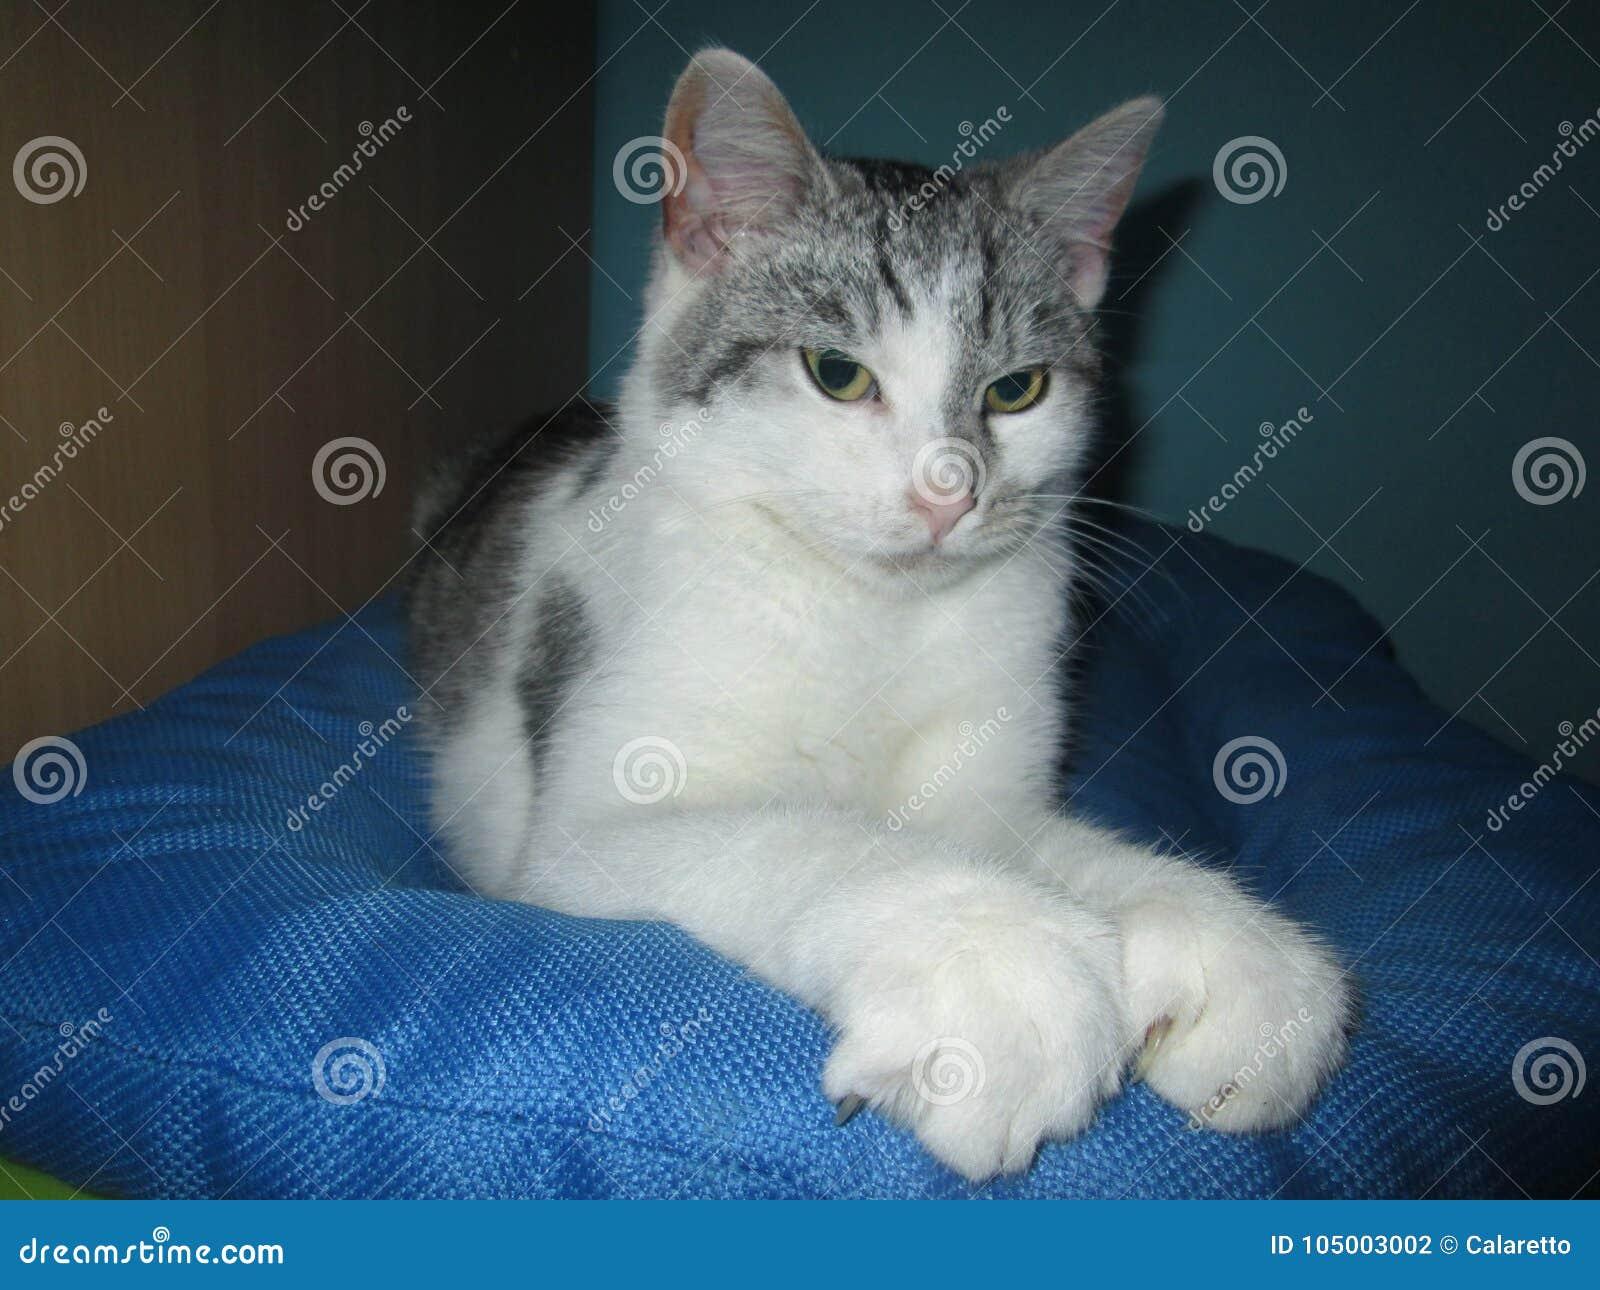 61431b87fe Silver tabby white cat stock photo. Image of whitetabby - 105003002